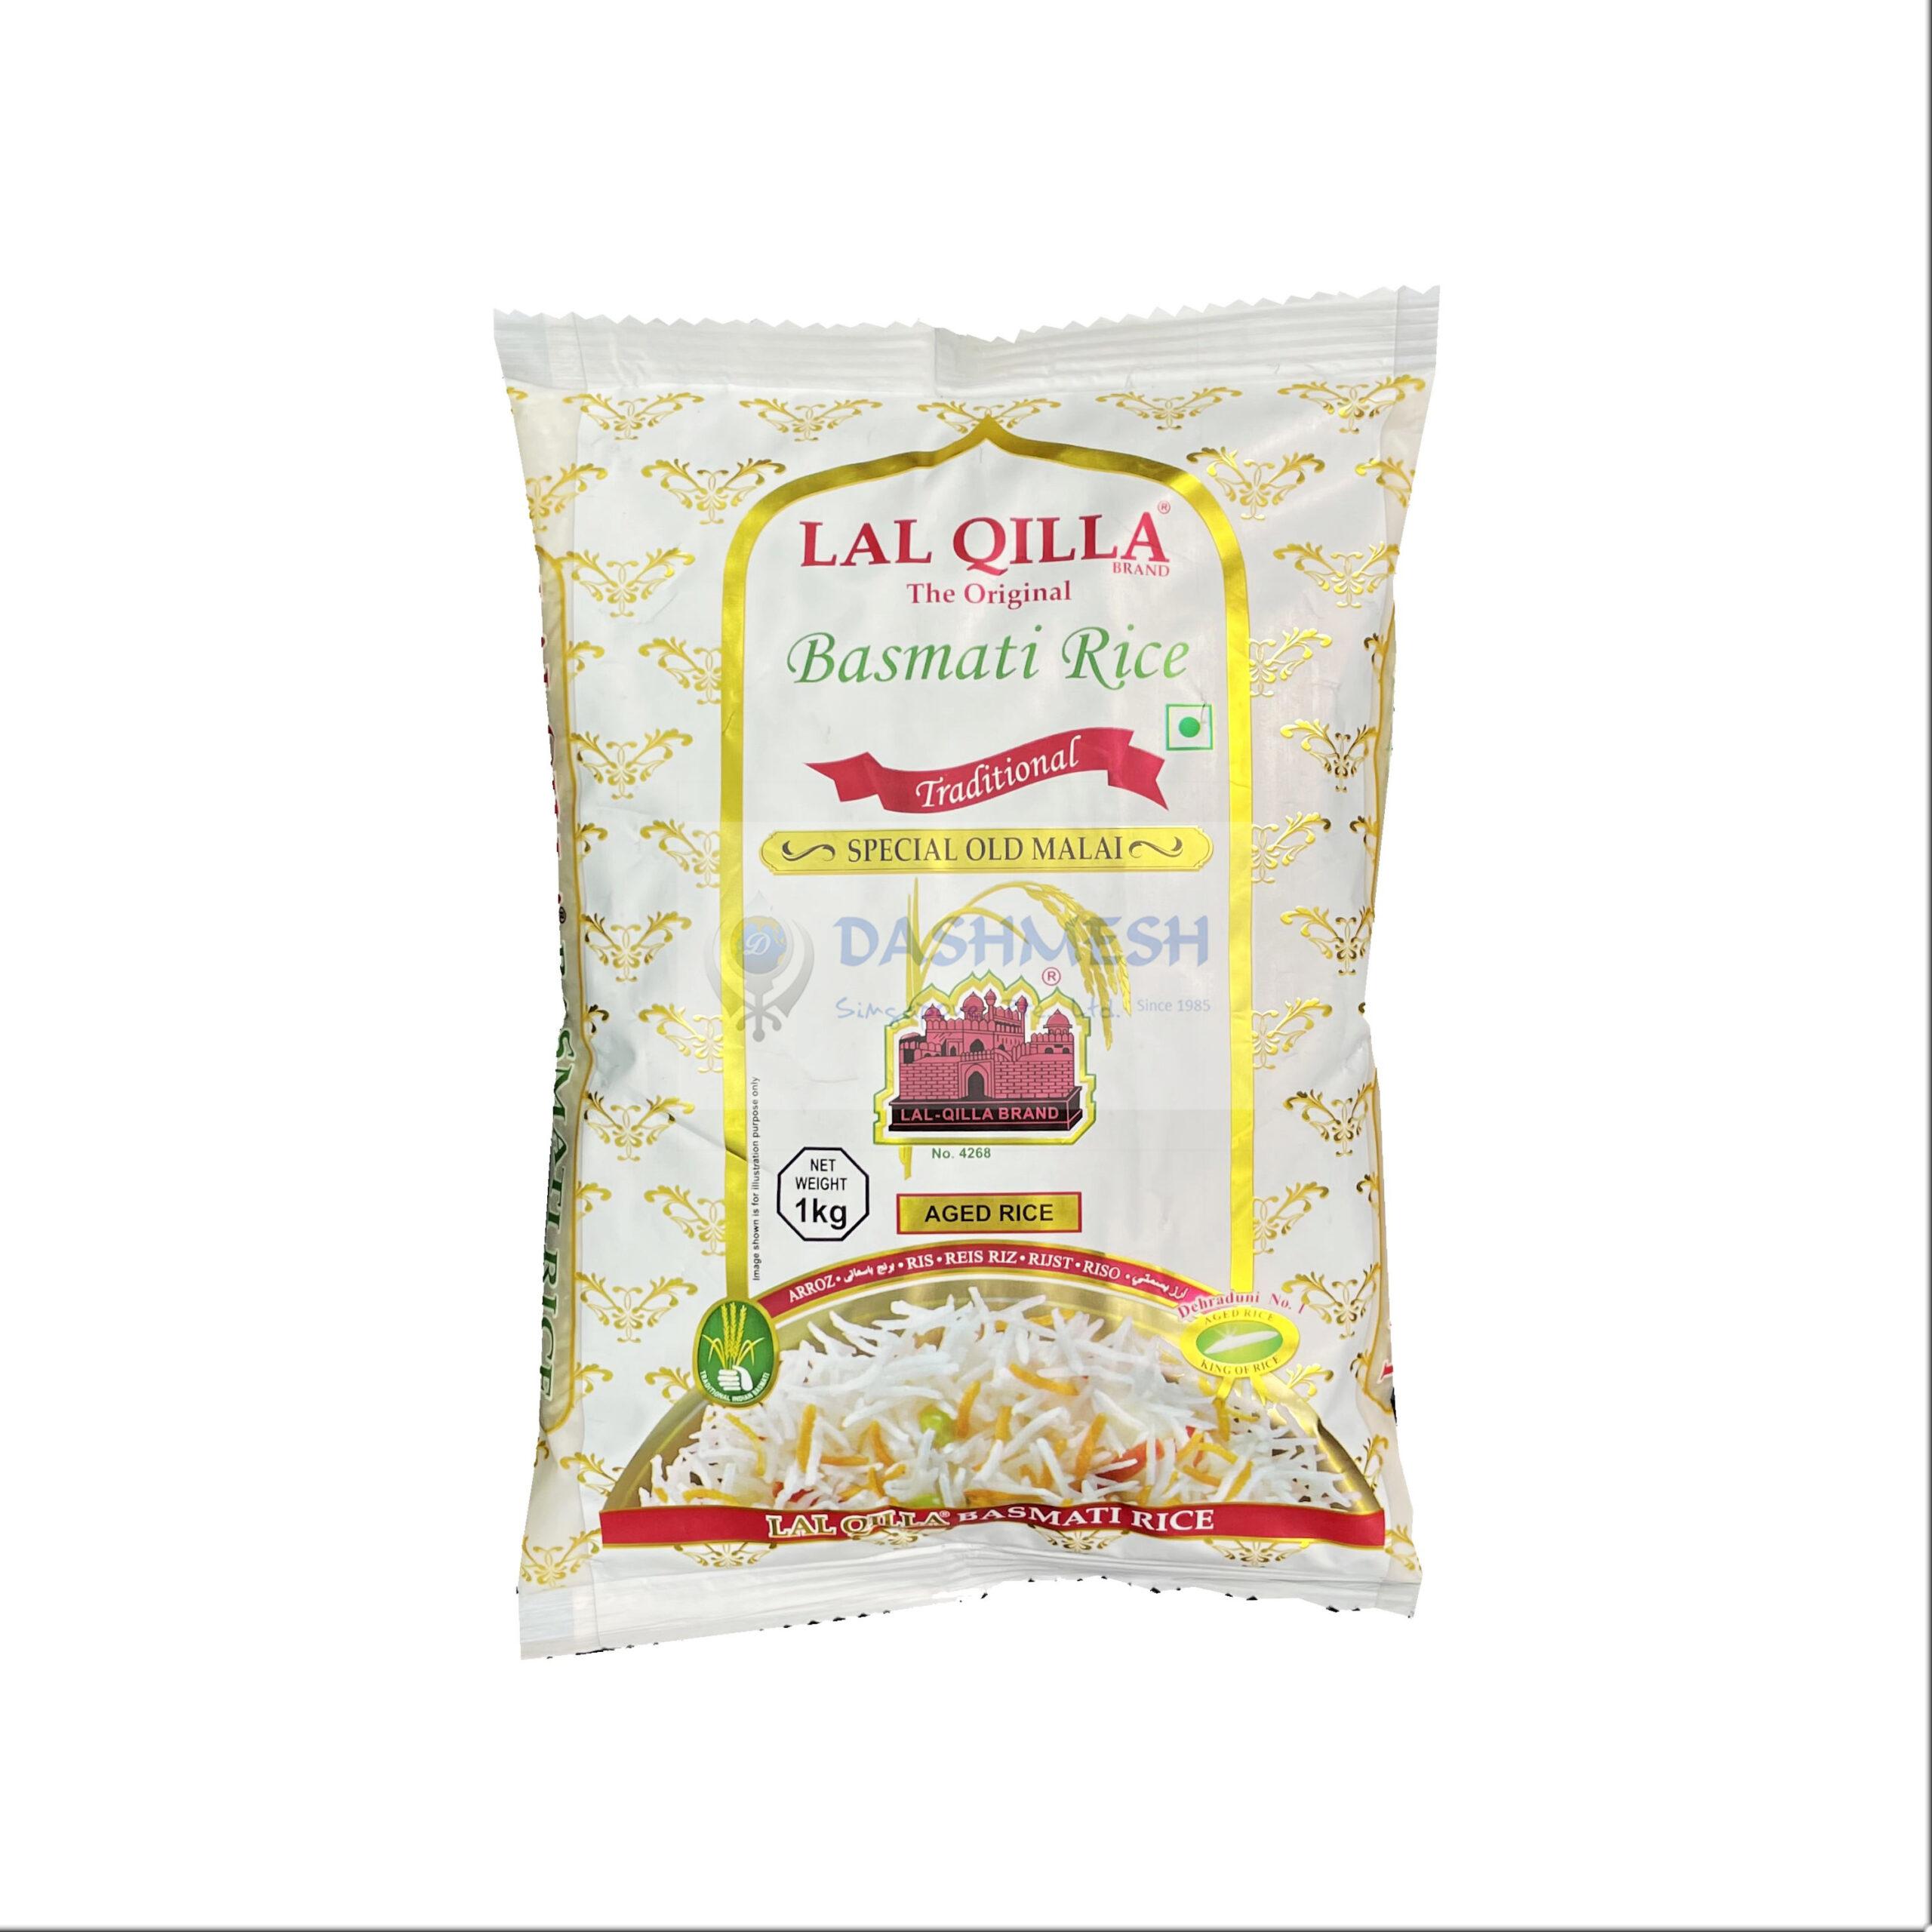 Lal Qilla Traditional Basmati Rice 1kg & 5kg